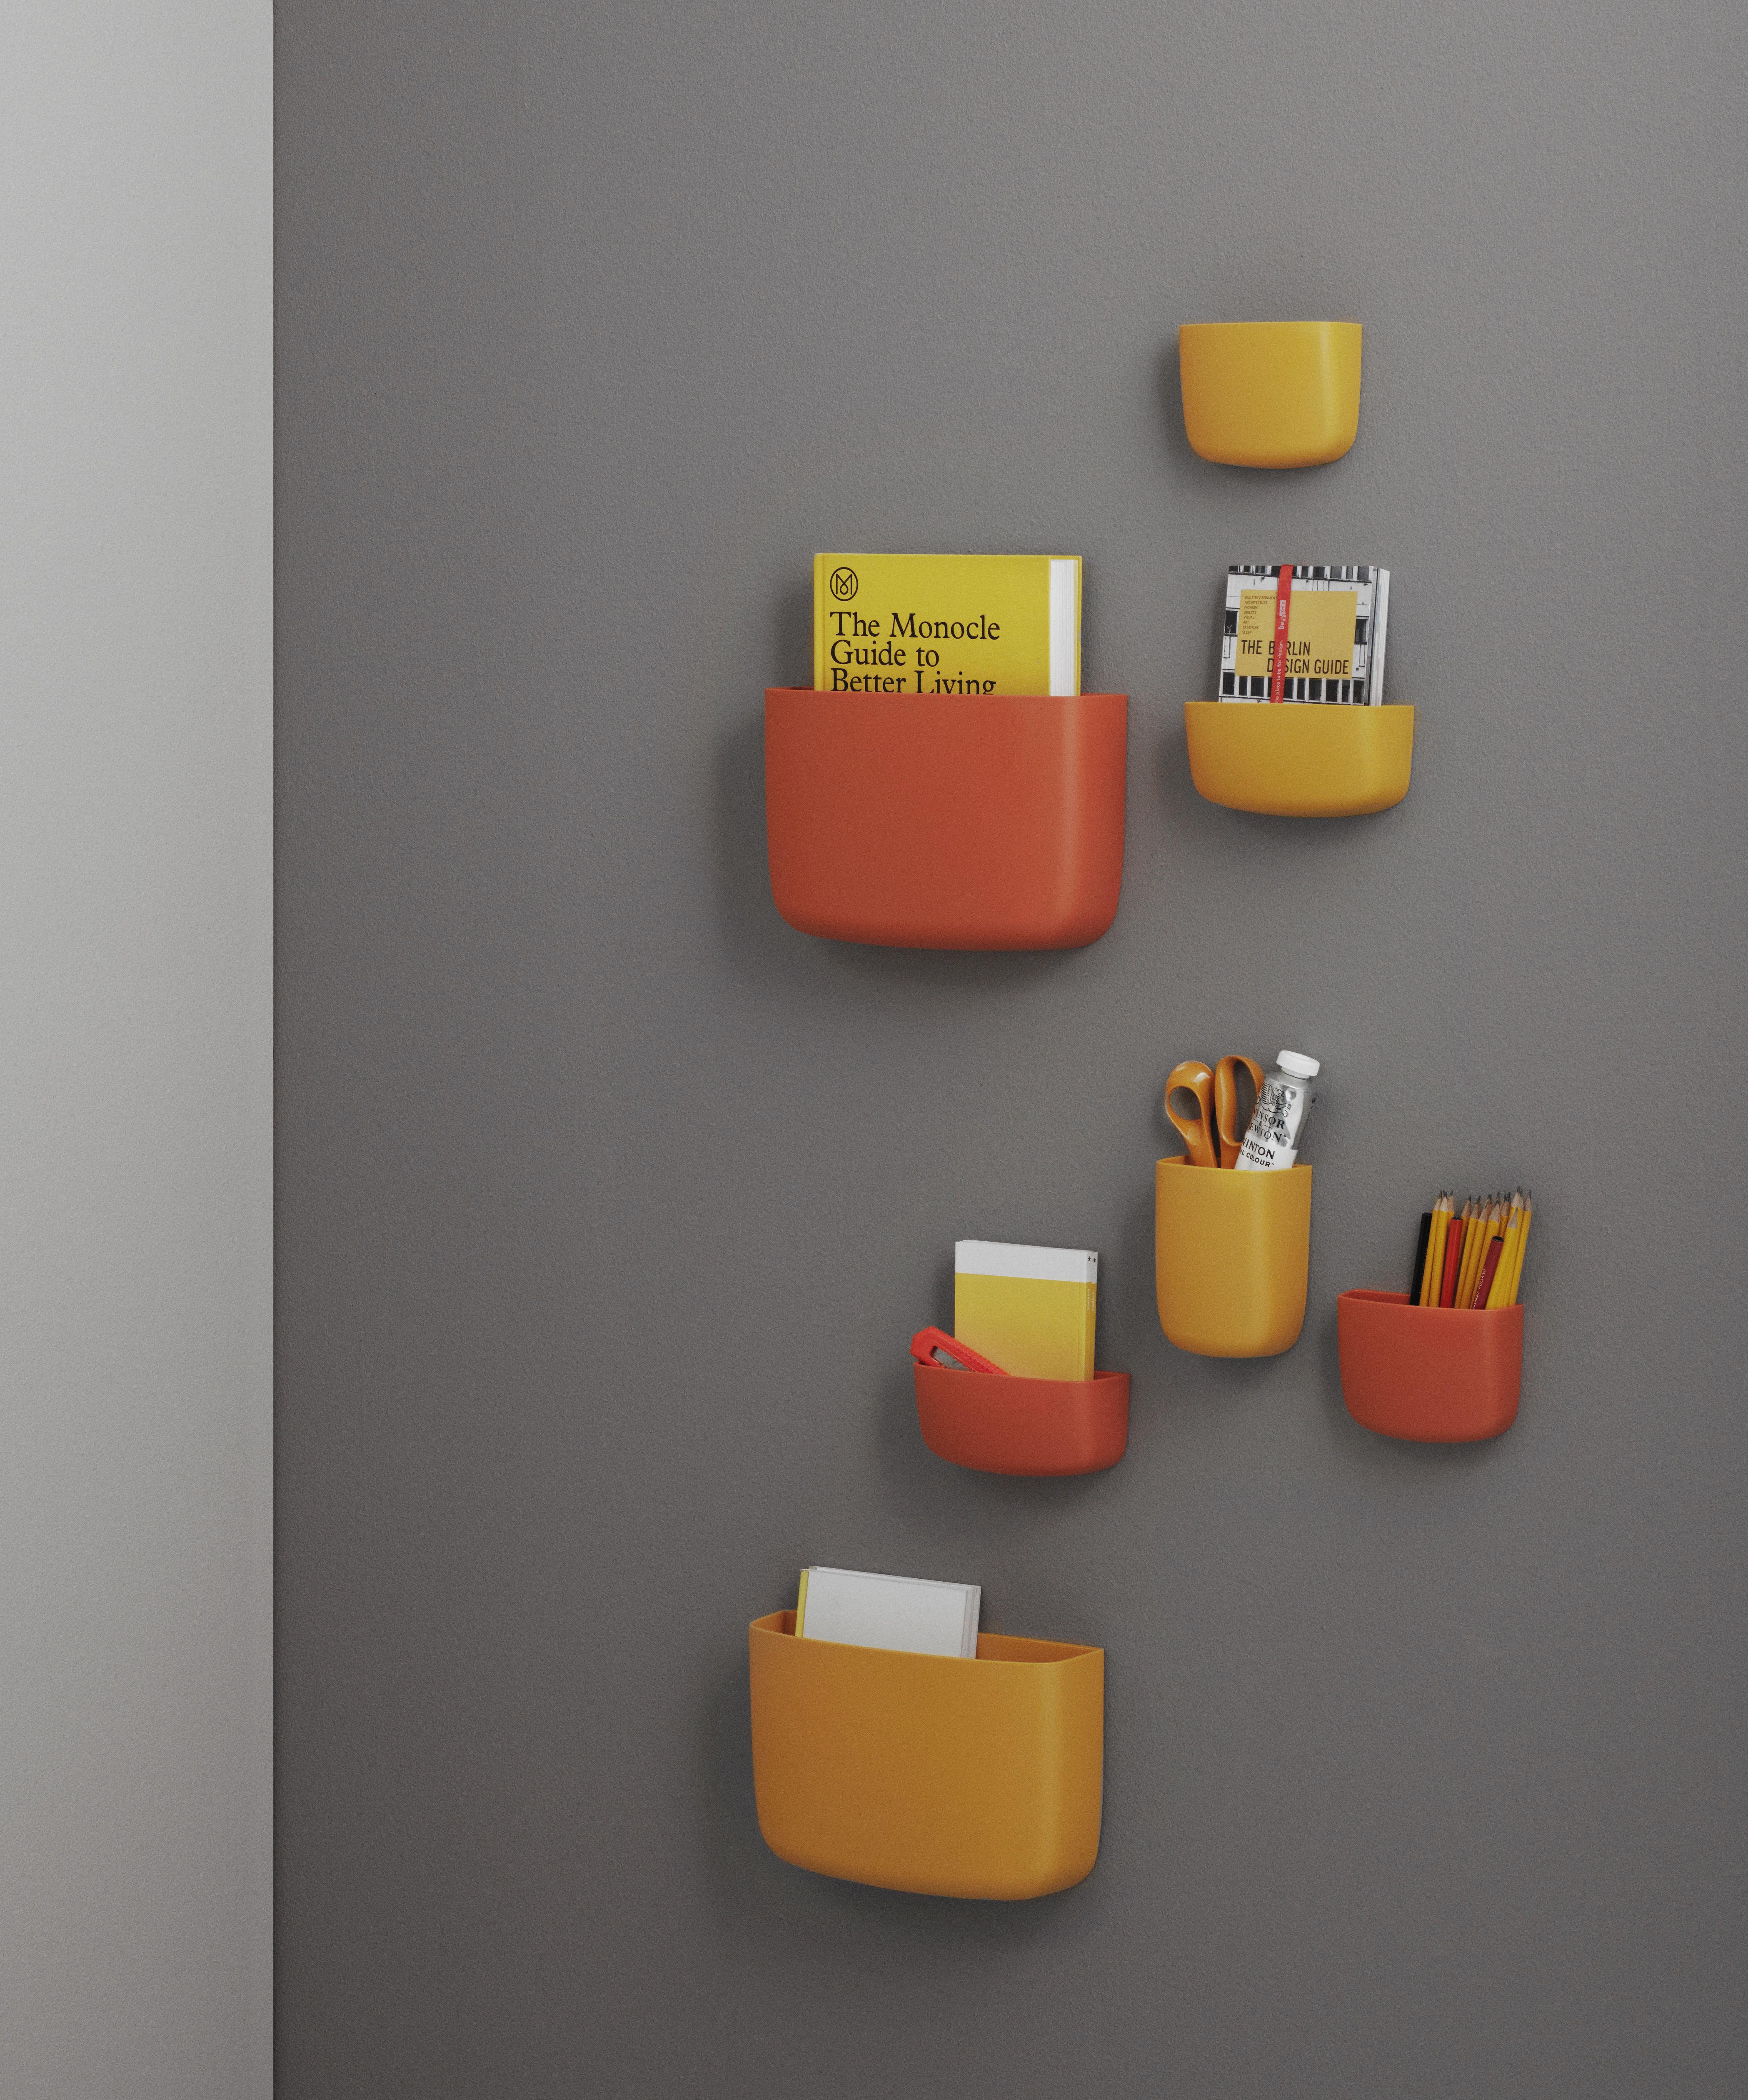 Home gt decoration gt kids gt pocket 3 wall storage by normann copenhagen